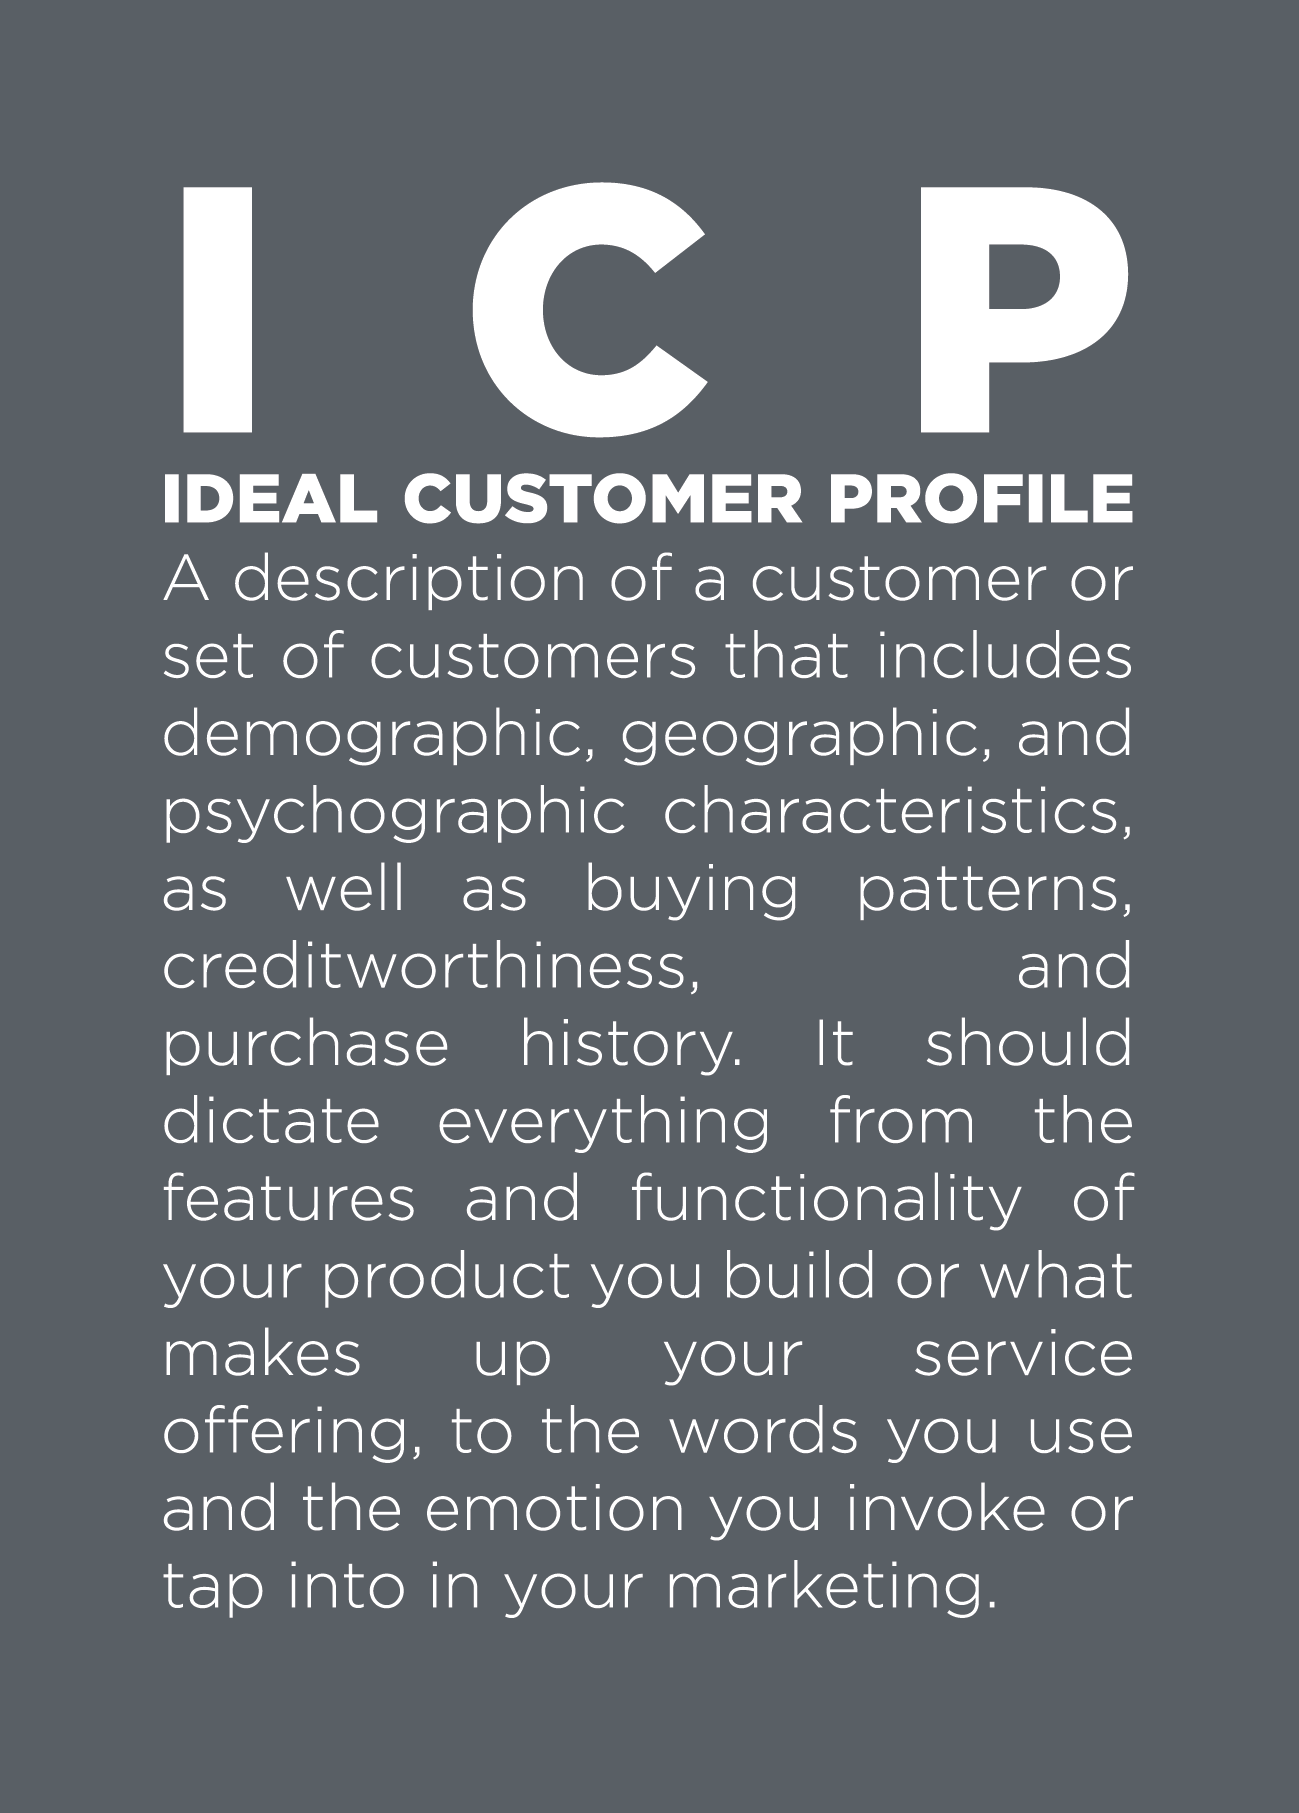 Icp  Ideal Customer Profile  BB Words